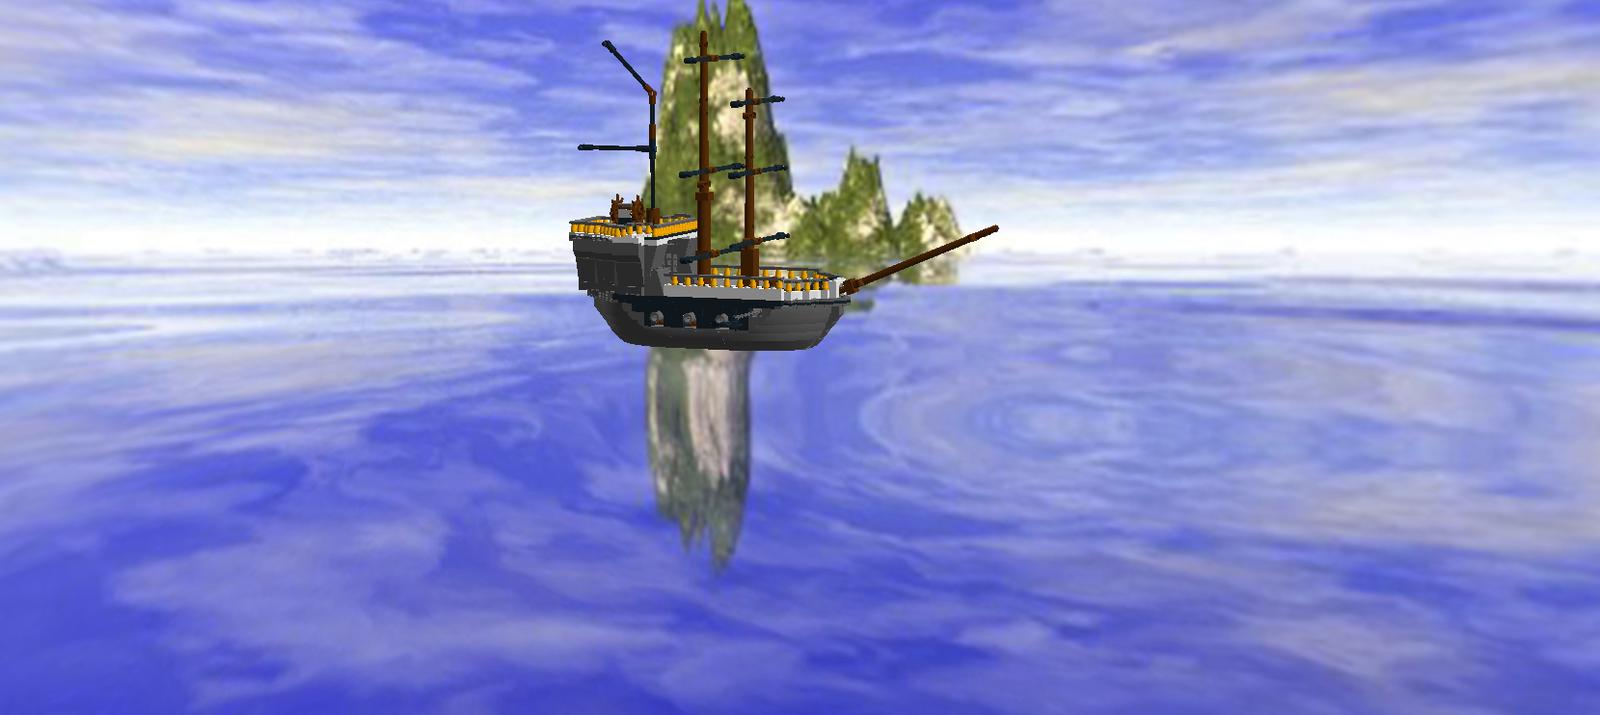 LEGO IDEAS - Product Ideas - The Pirate Schooner